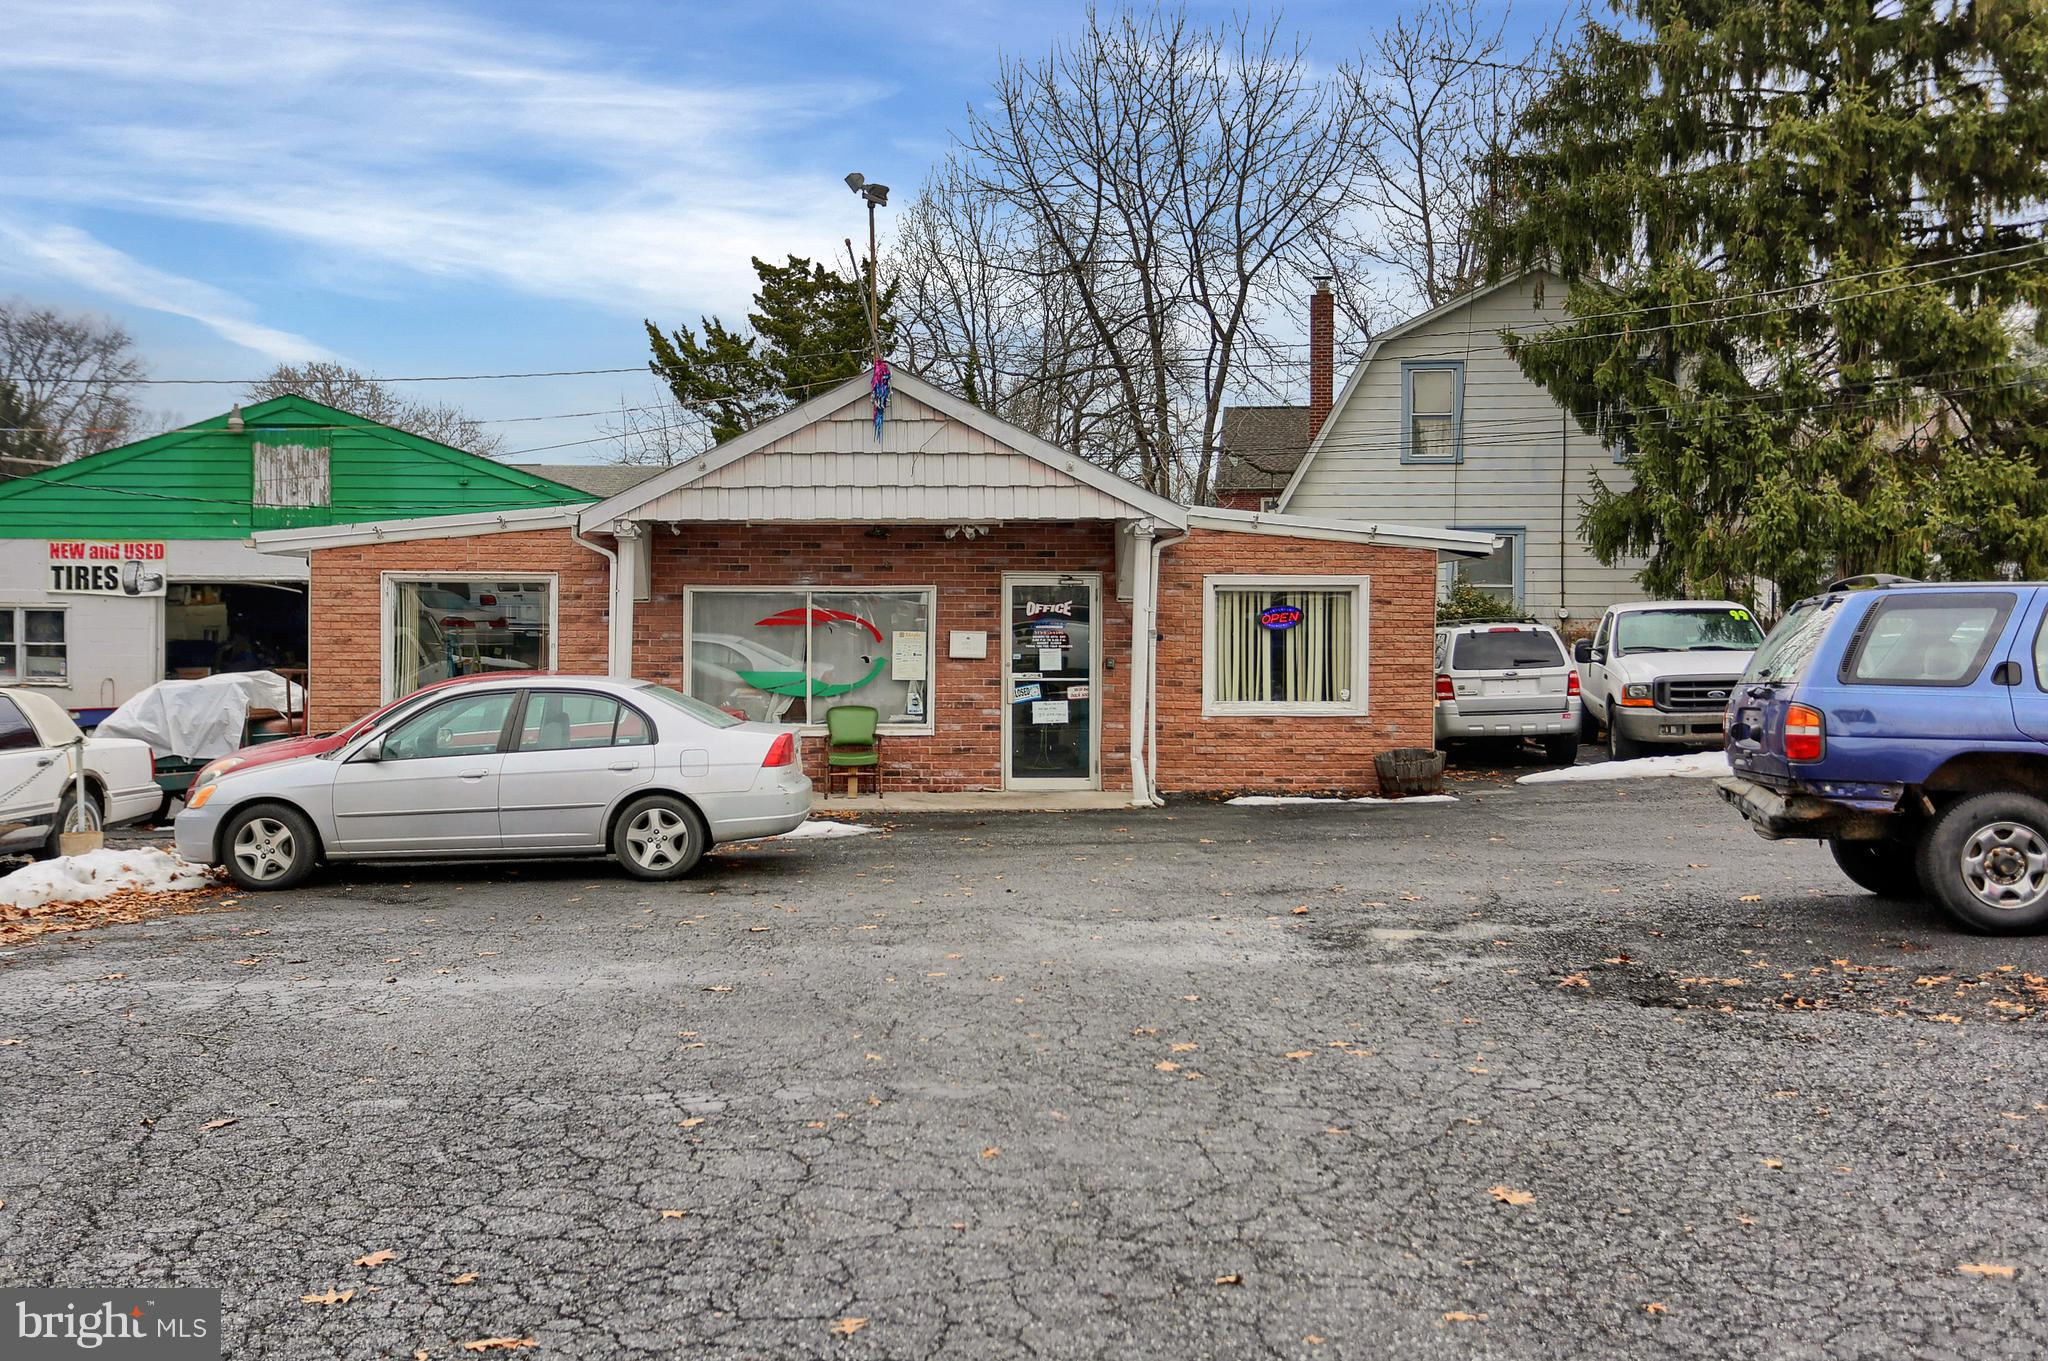 2301 HERR STREET, HARRISBURG, PA 17103